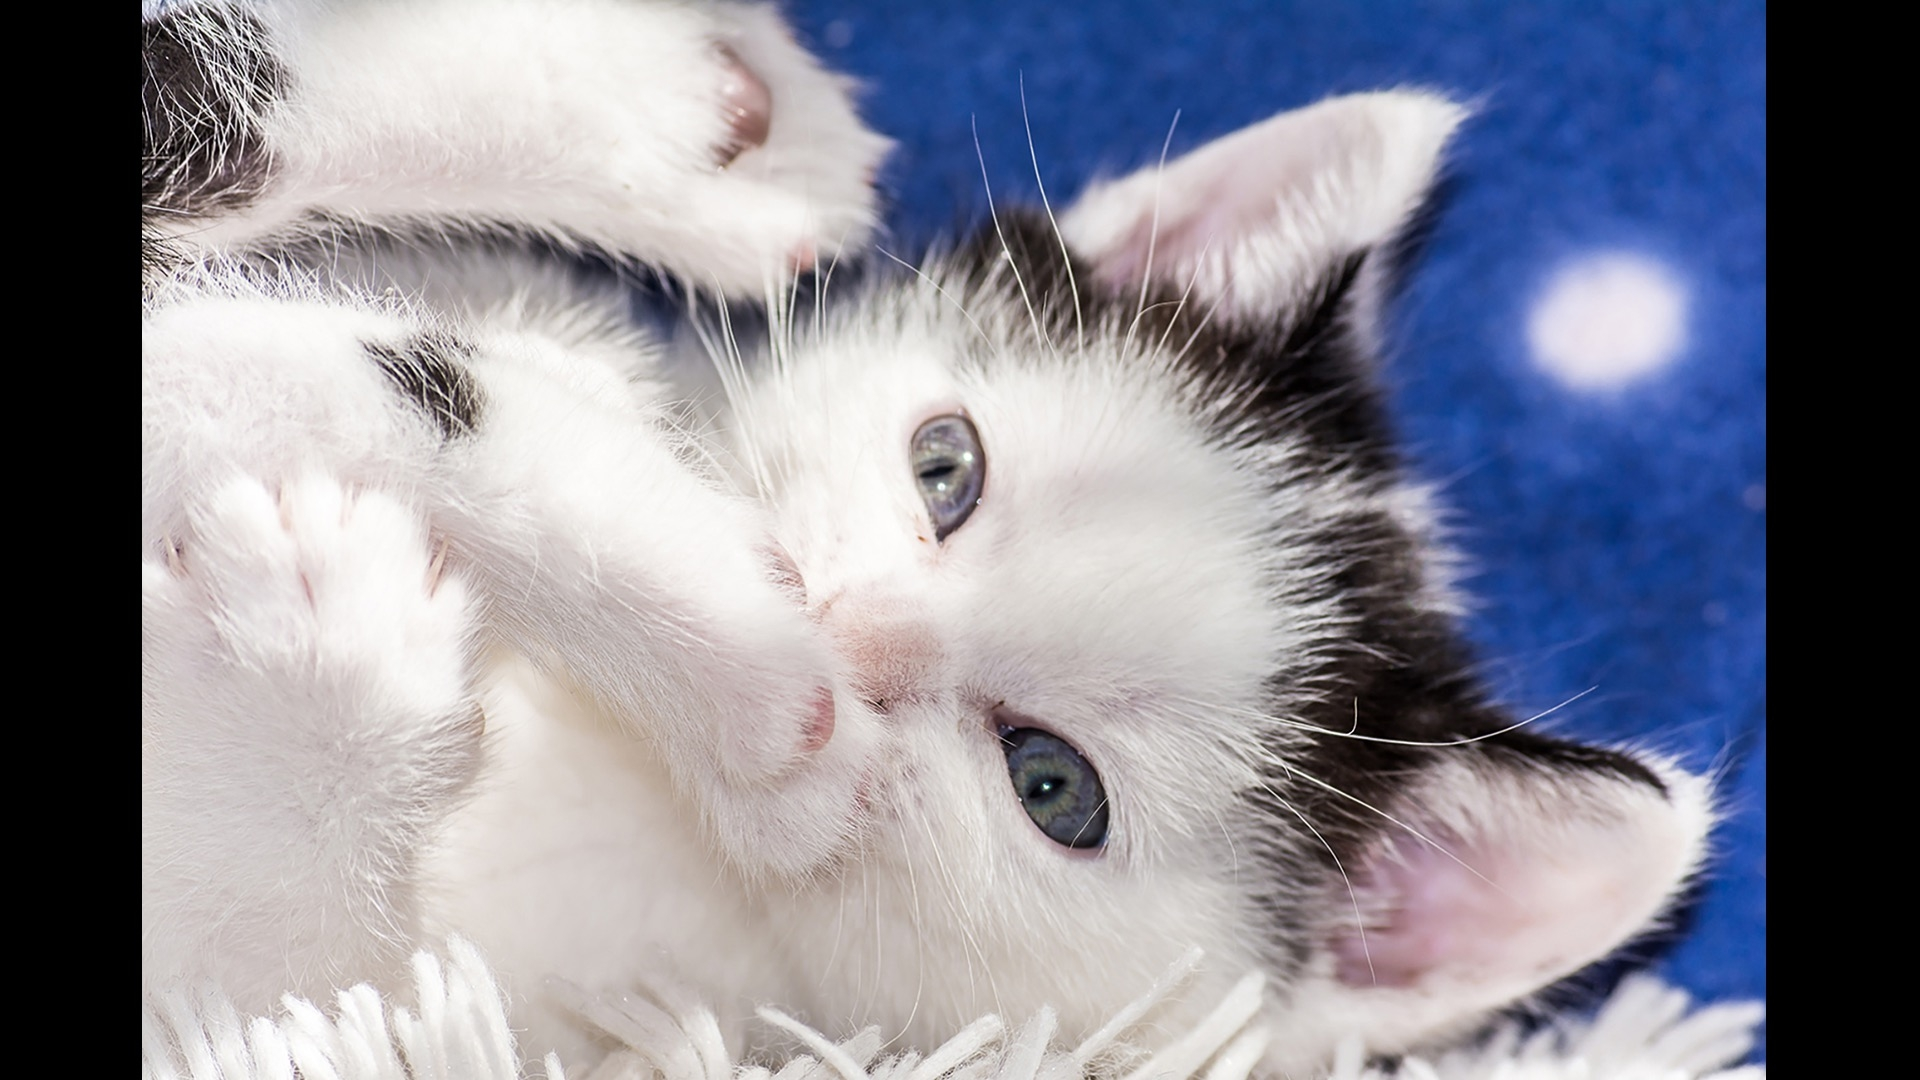 cat chewing on toenail